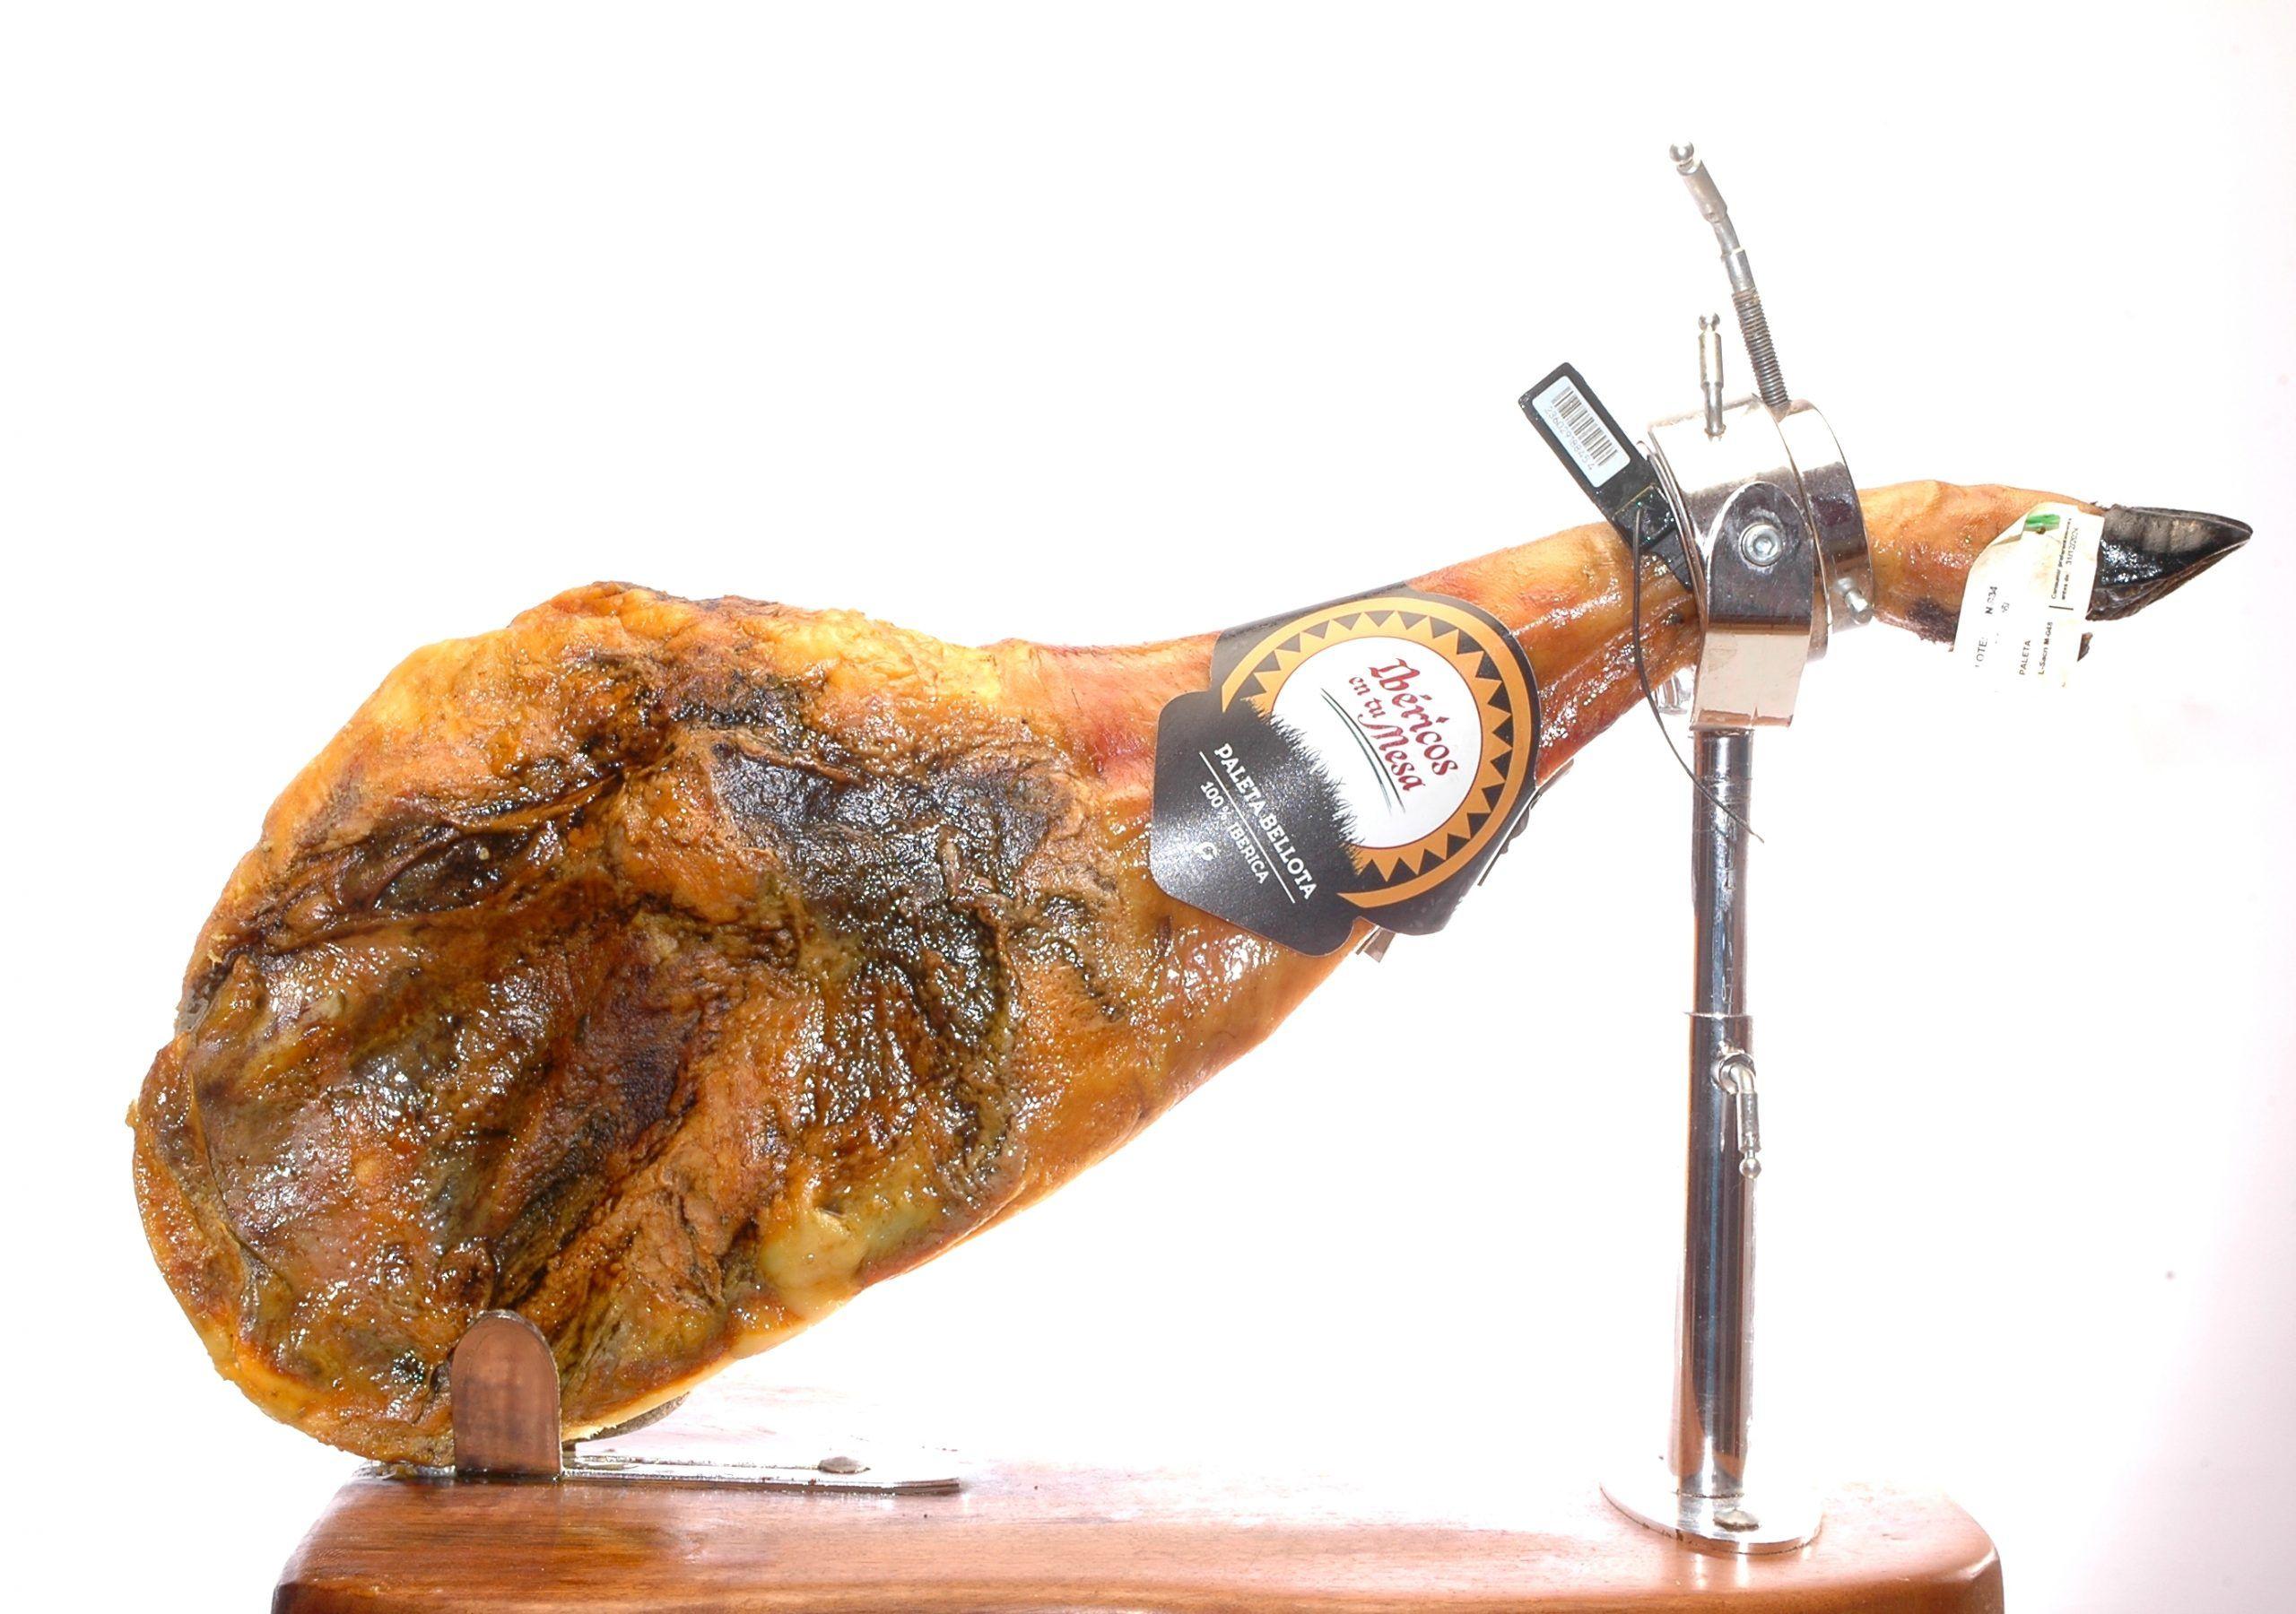 PALETON de bellota 100% Ibérico 6kg brida negra certificada.